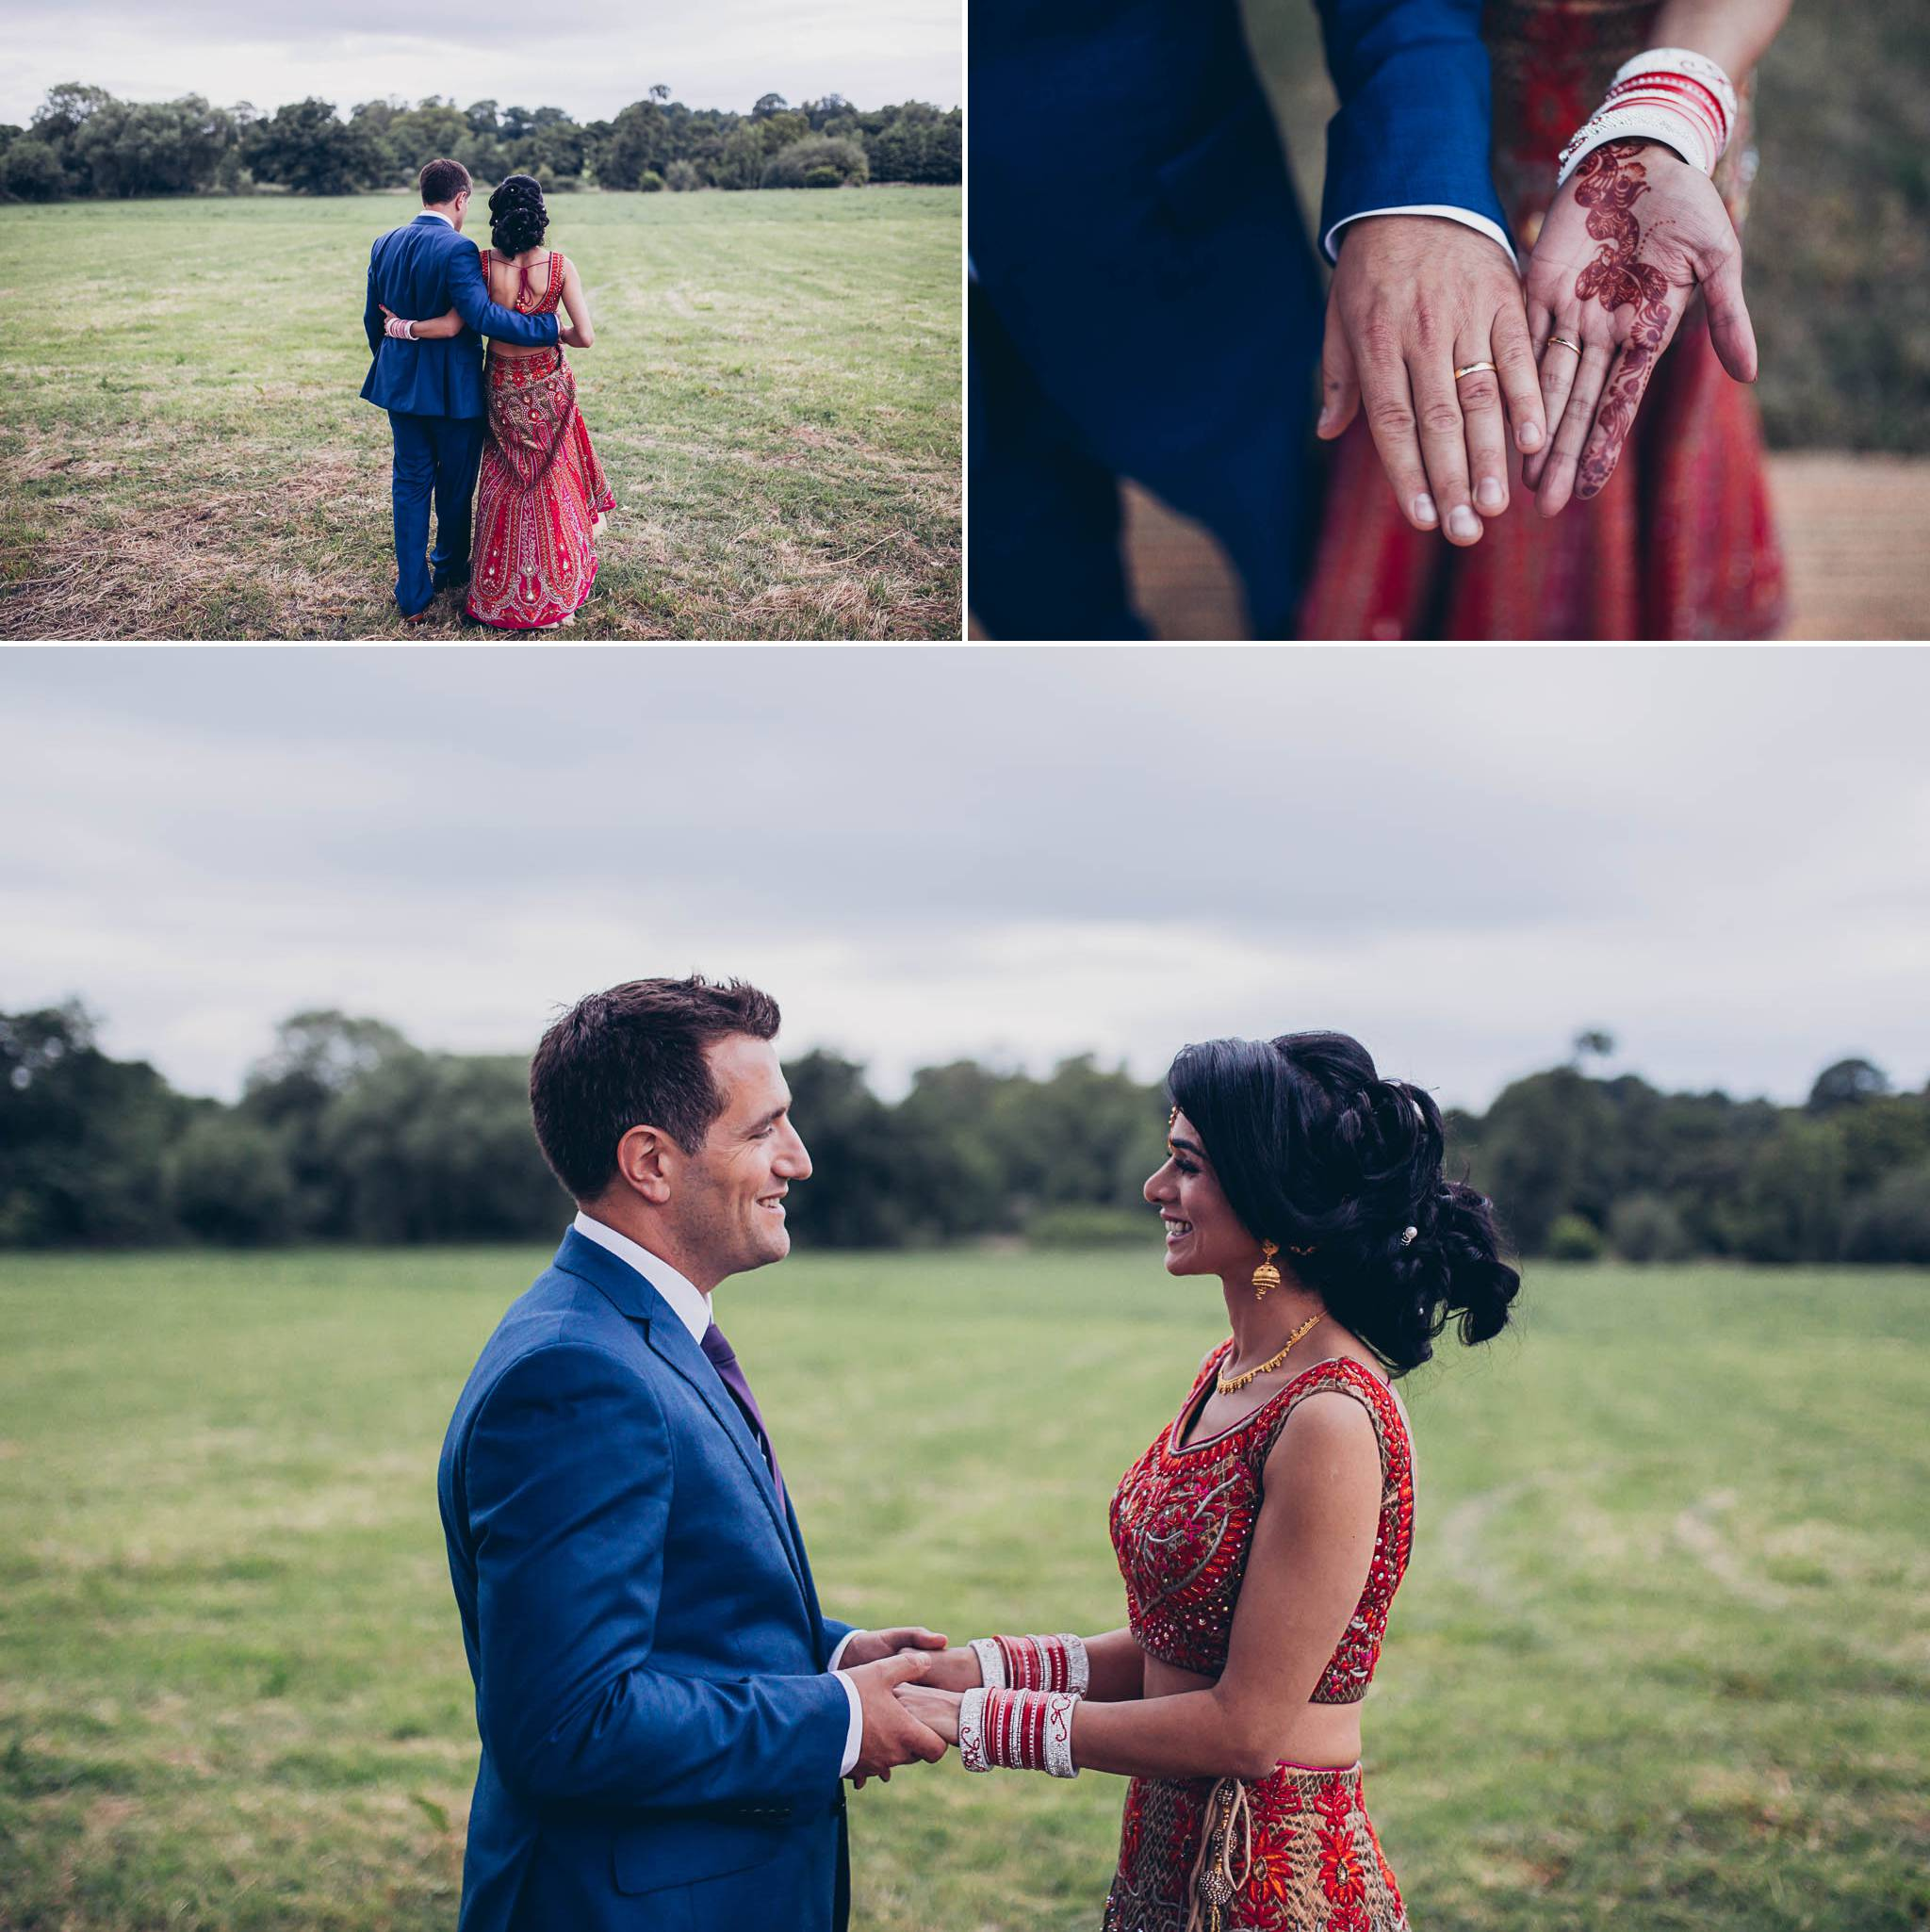 wedding-photographer-staffordshire 31.jpg